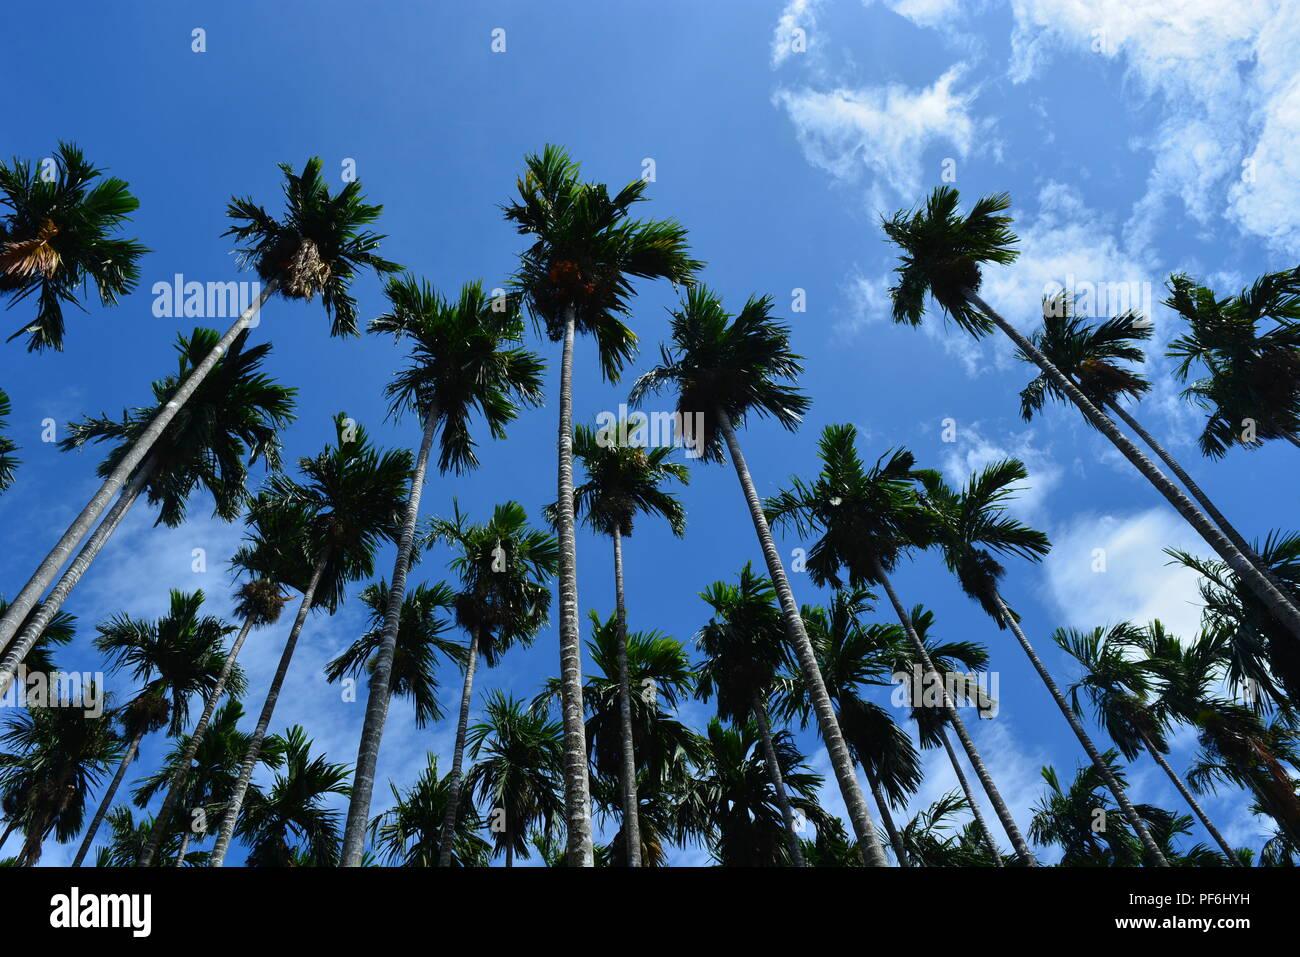 Areca nut tree - Stock Image